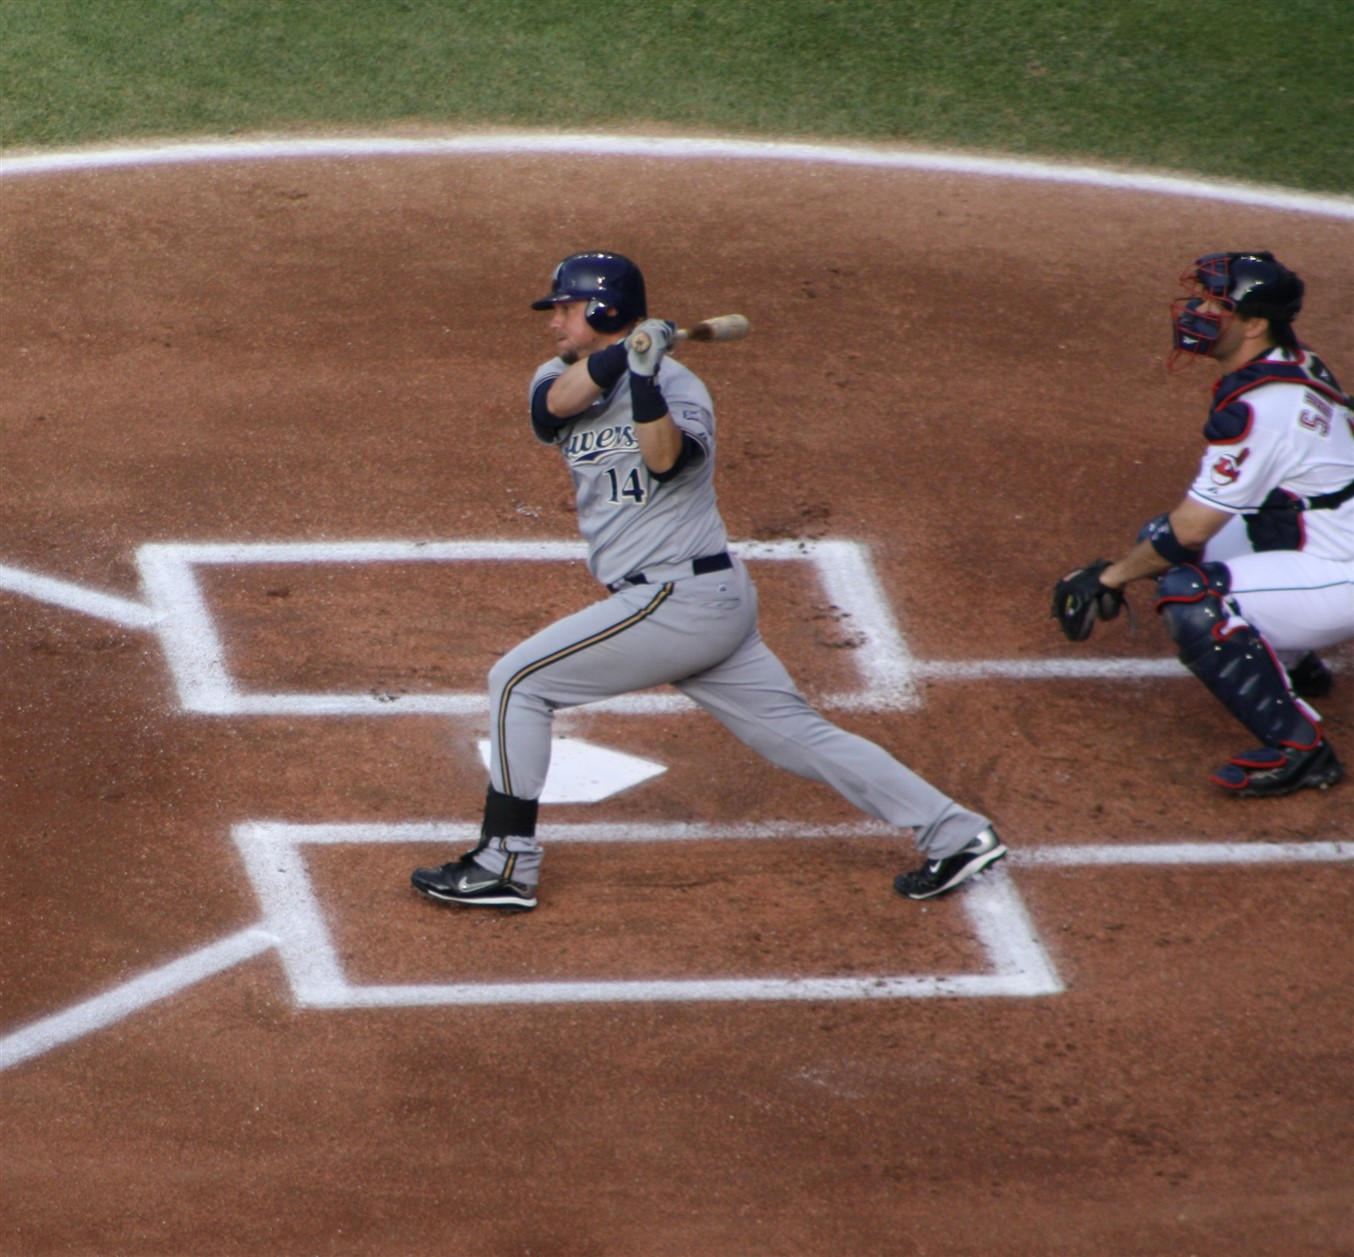 2009 06 15 Cleveland Indians 2.jpg